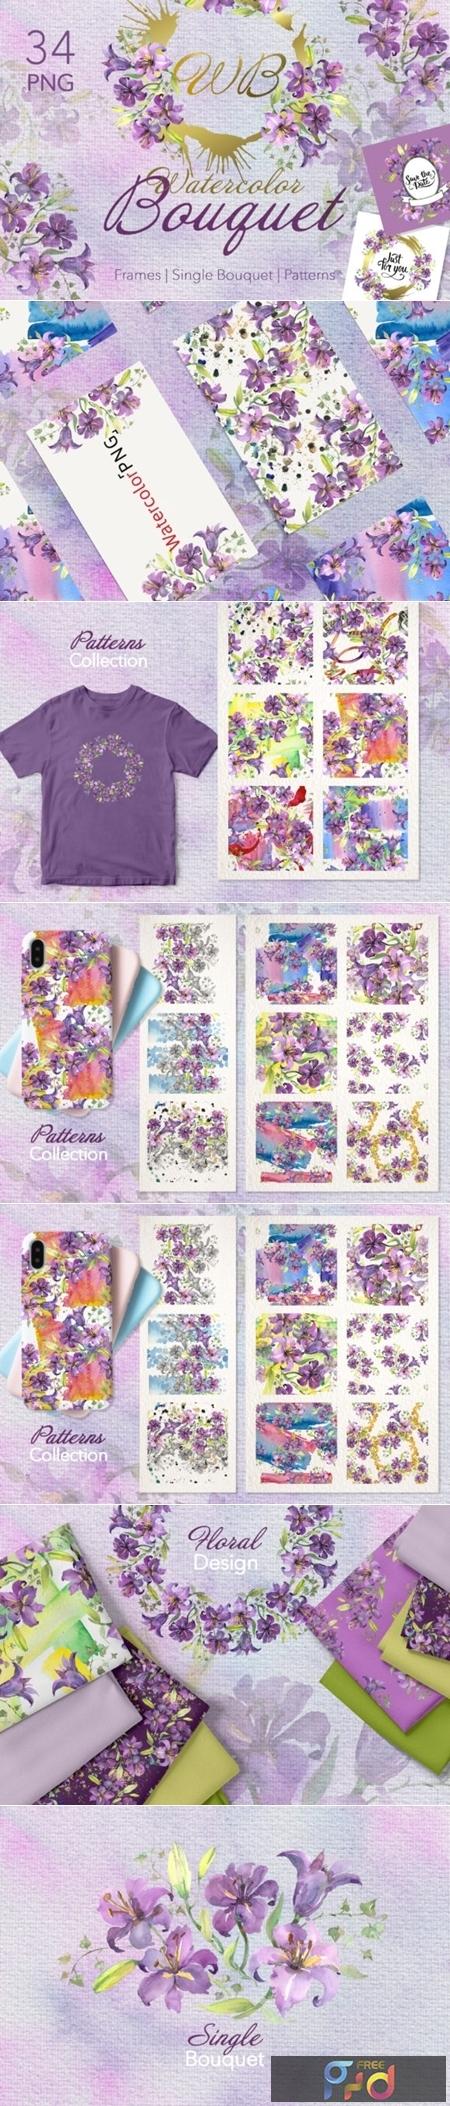 Purple Watercolor Bouquet of Lilies 1558405 1